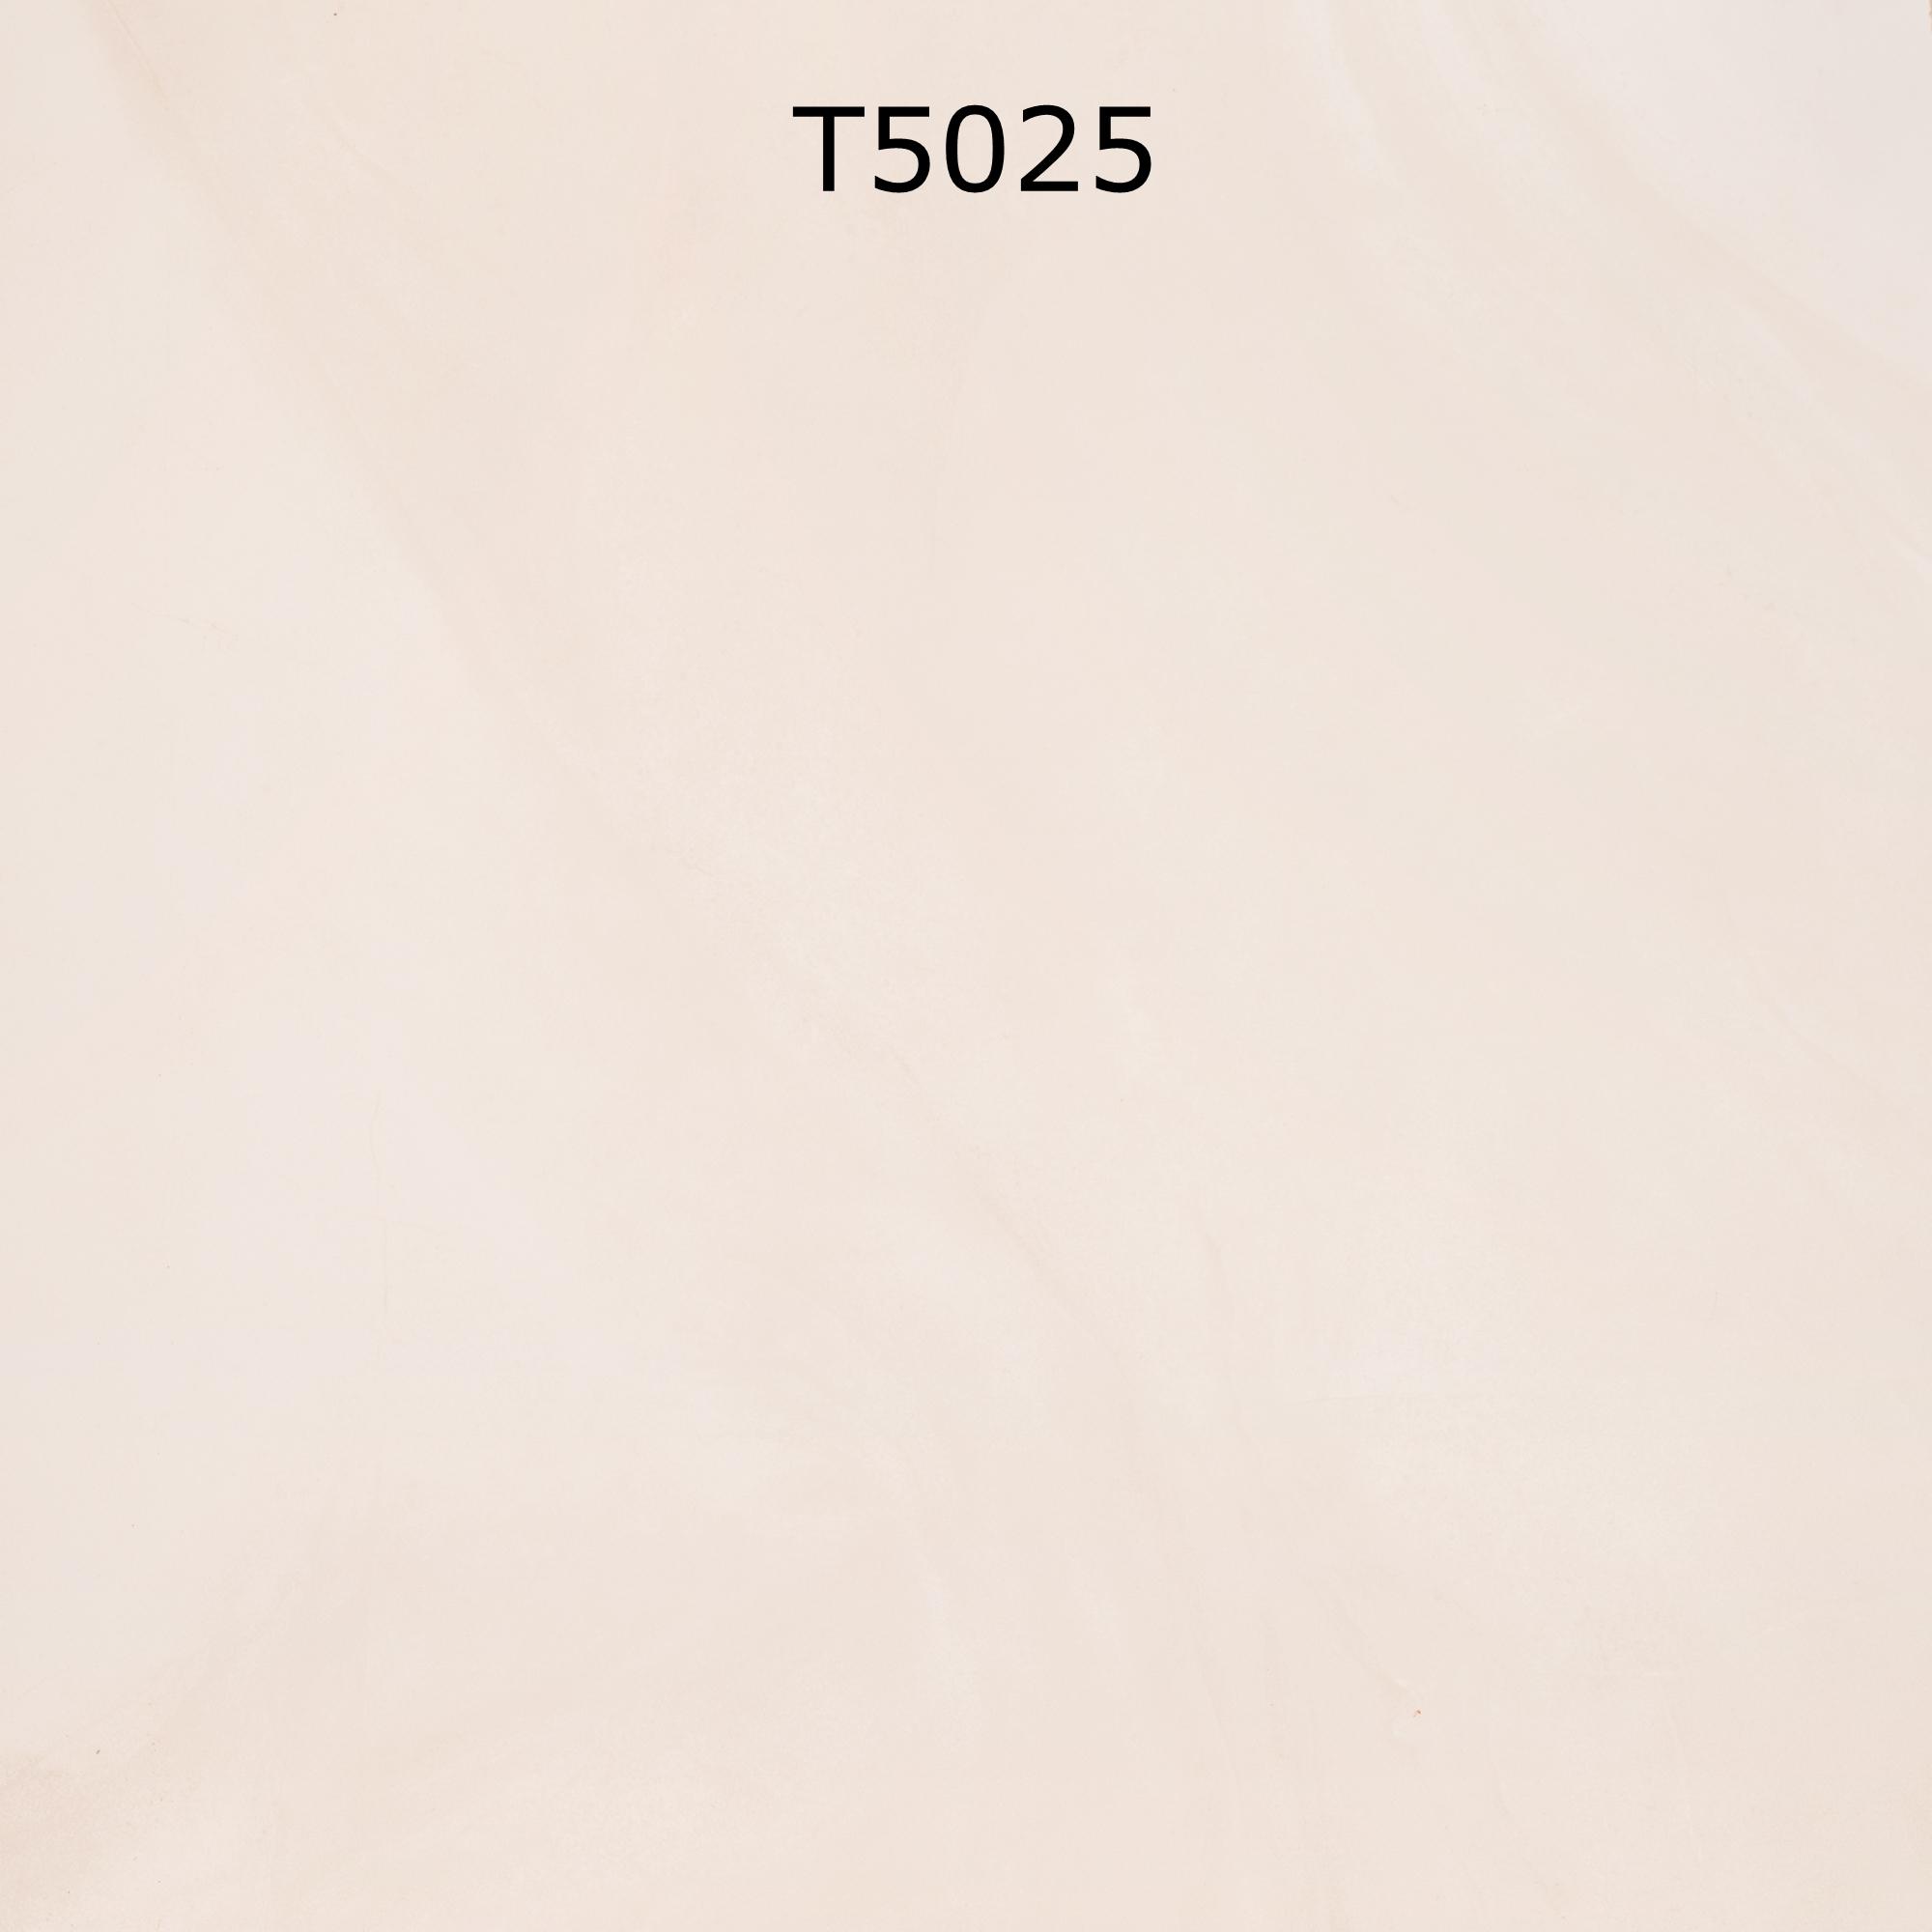 T5025